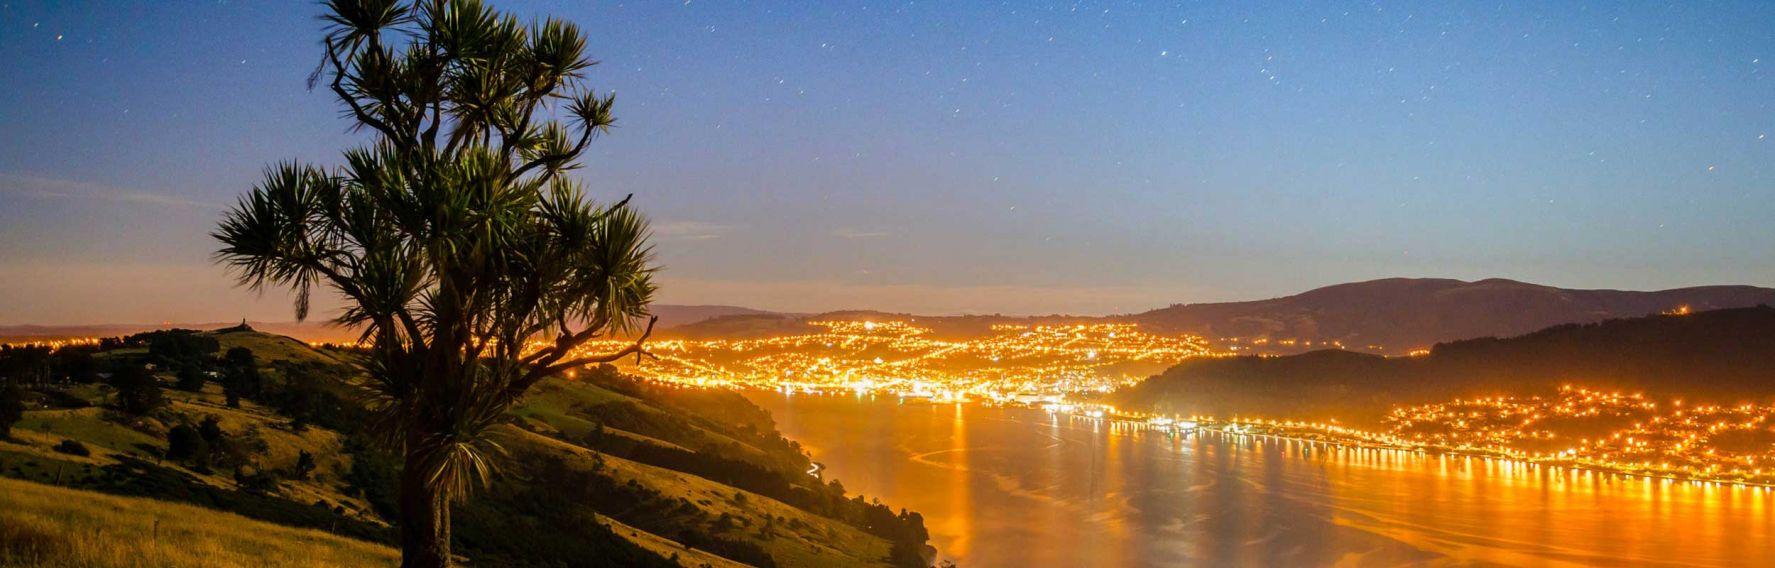 Cityscape Otago Peninsula at night